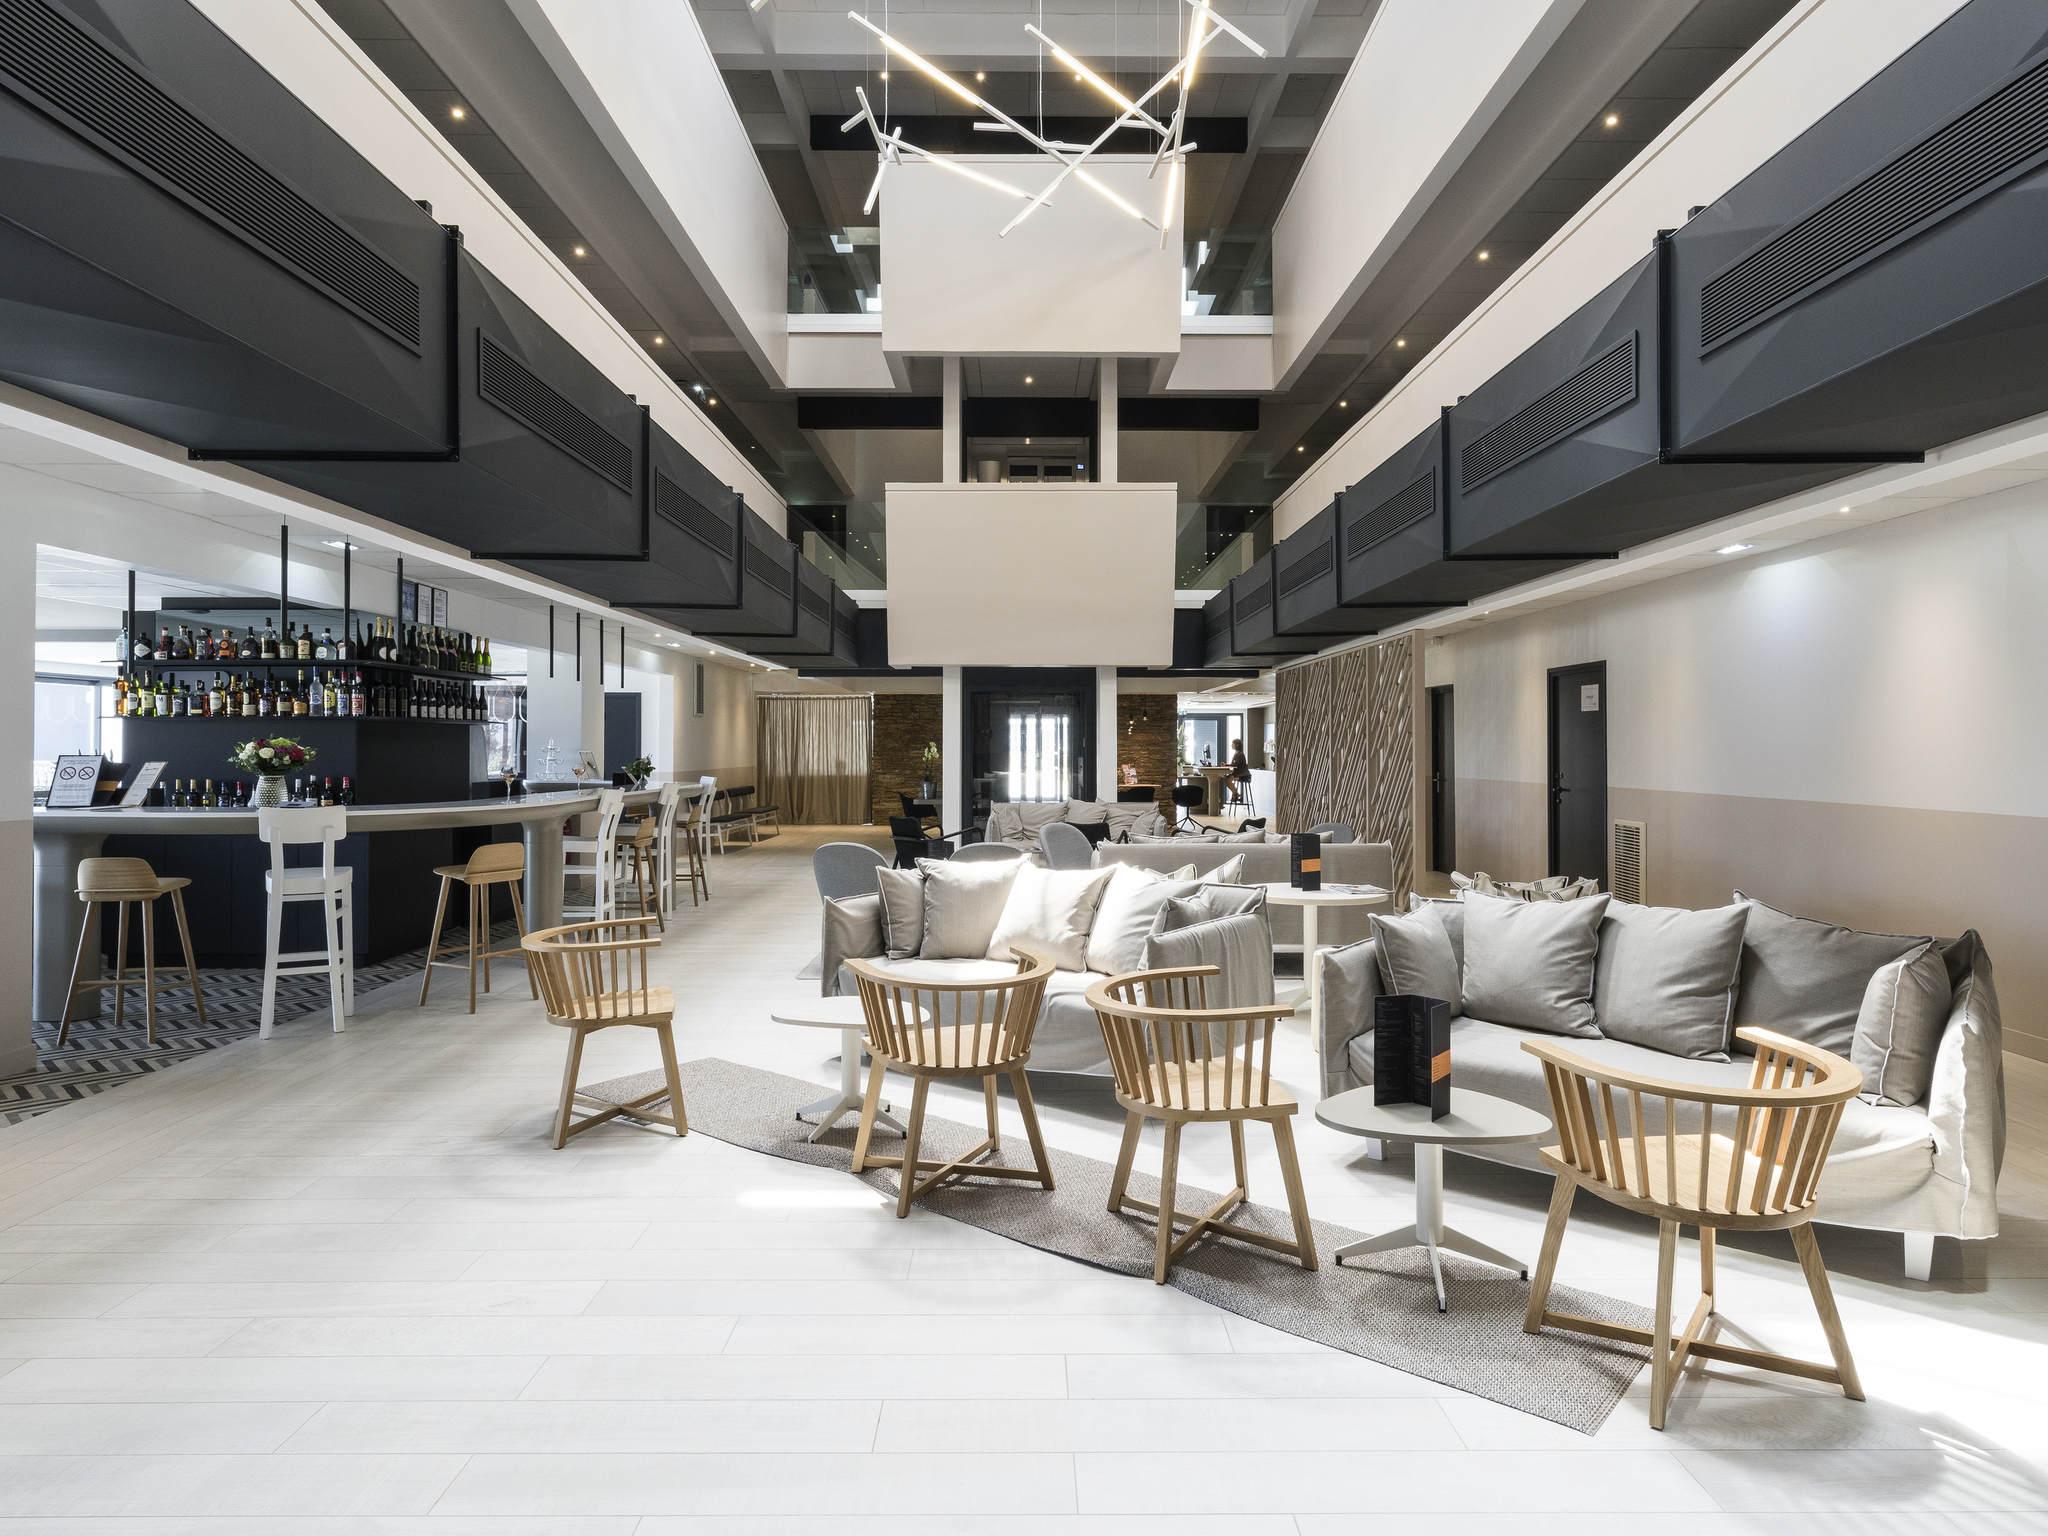 Hotel - Mercure Bastia Biguglia Hotel (opening May 2018)